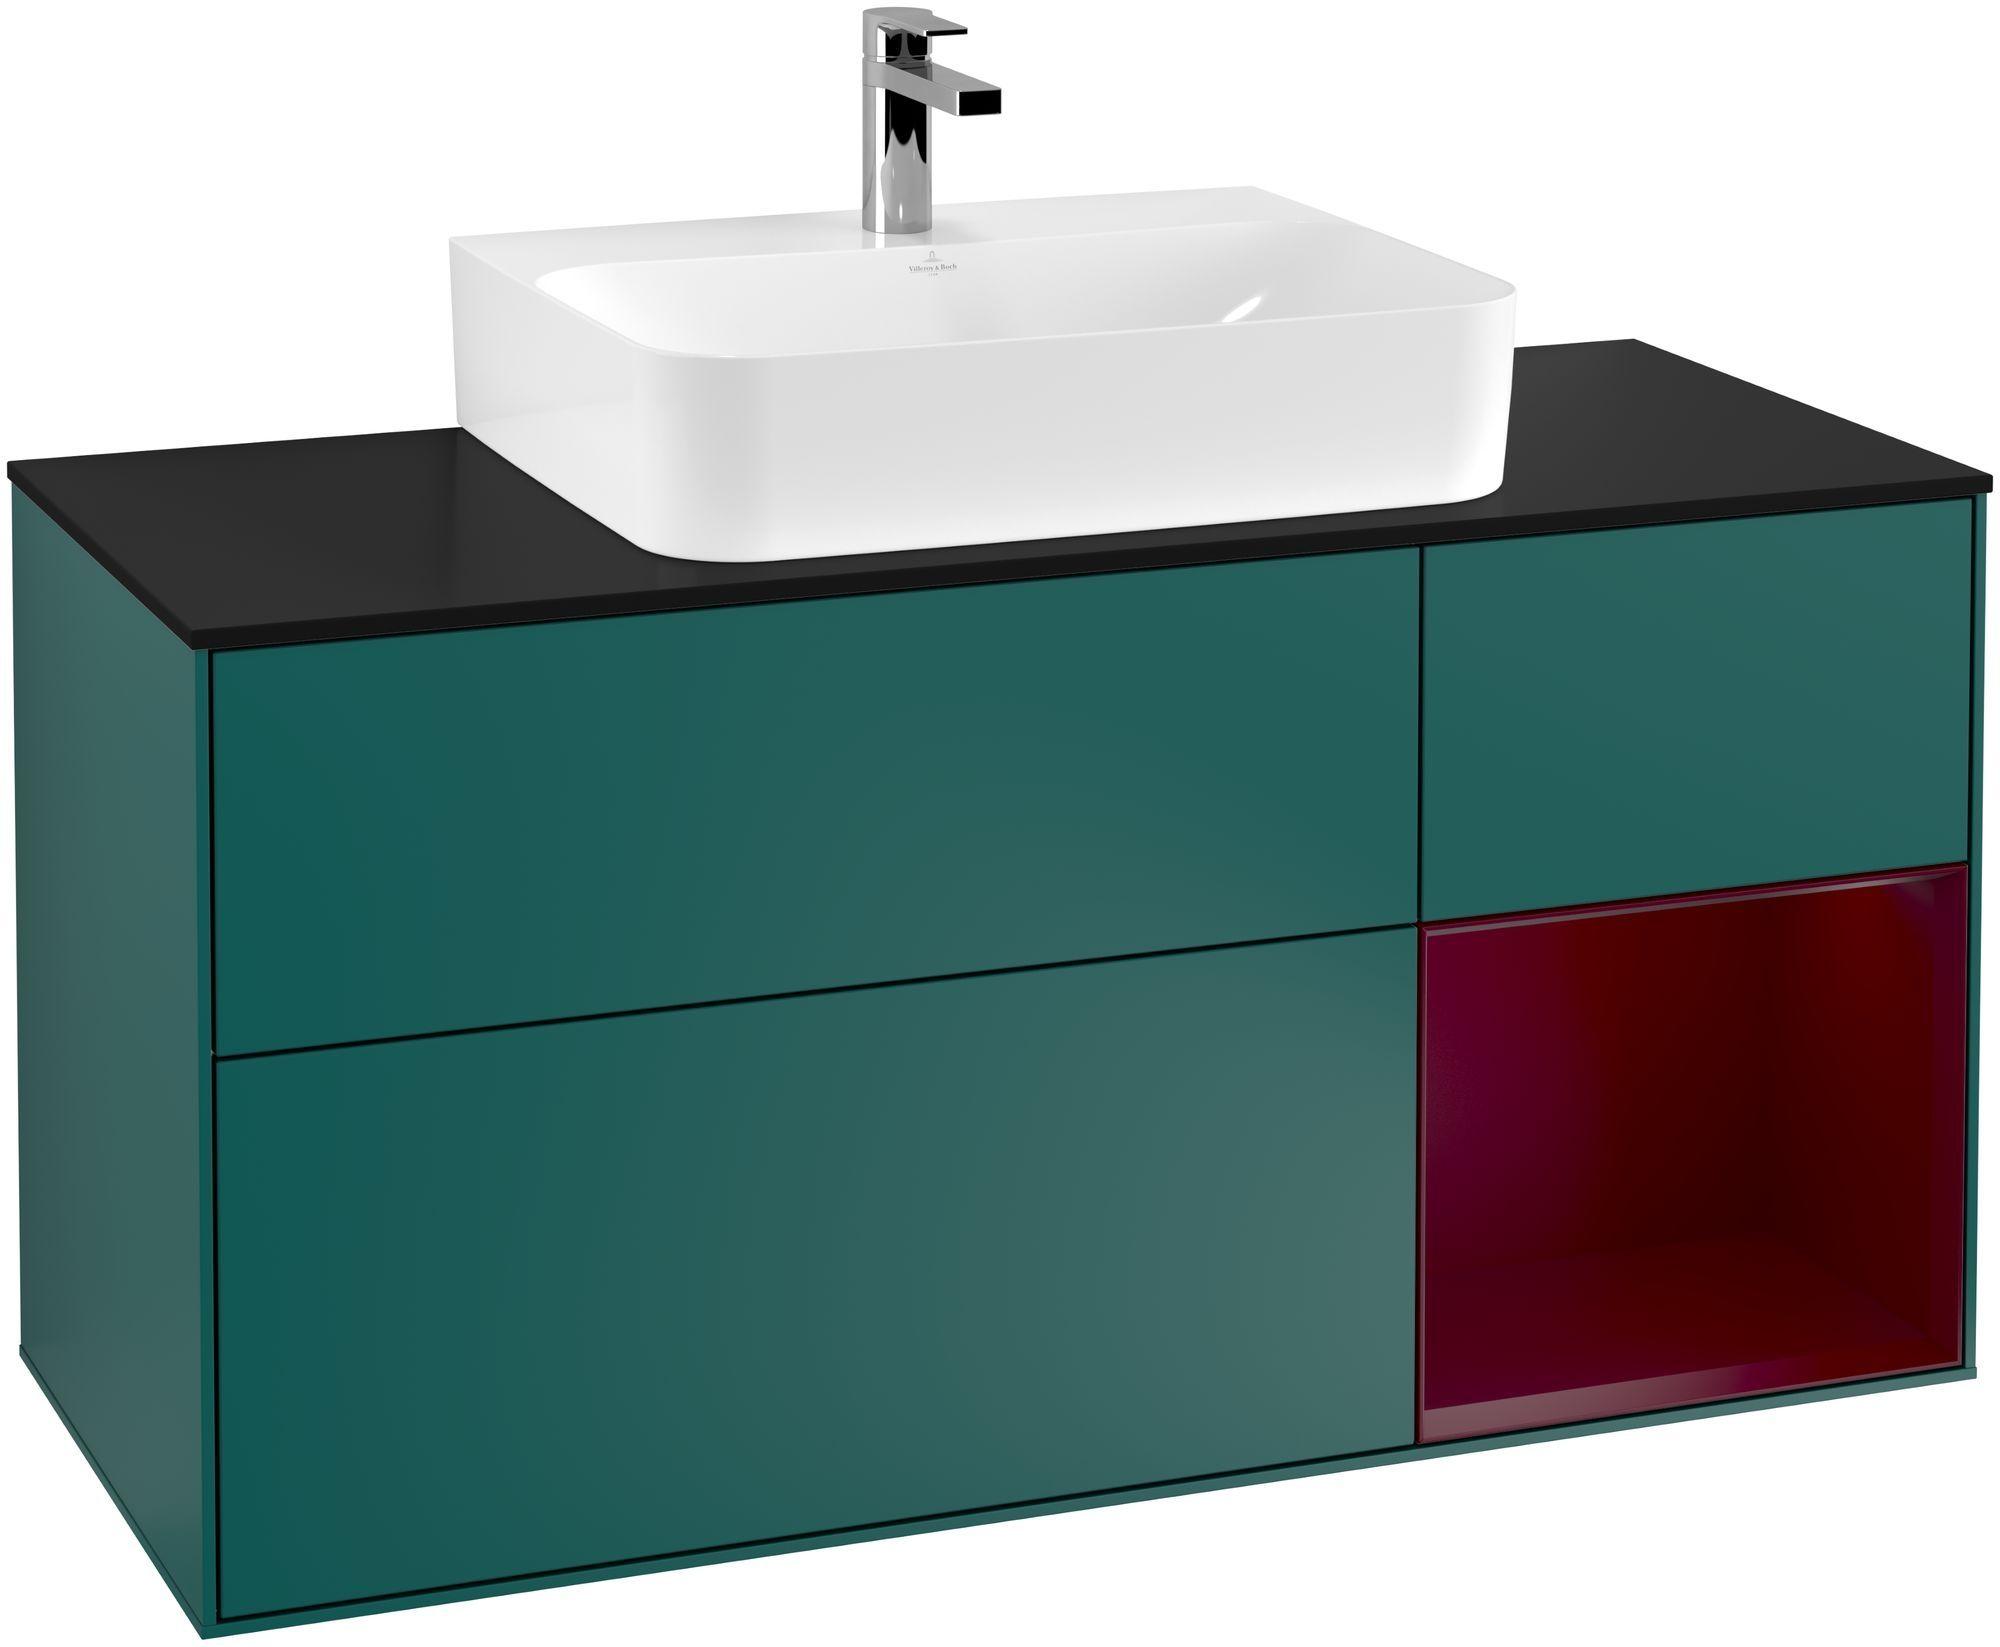 Villeroy & Boch Finion G17 Waschtischunterschrank mit Regalelement 3 Auszüge Waschtisch mittig LED-Beleuchtung B:120xH:60,3xT:50,1cm Front, Korpus: Cedar, Regal: Peony, Glasplatte: Black Matt G172HBGS